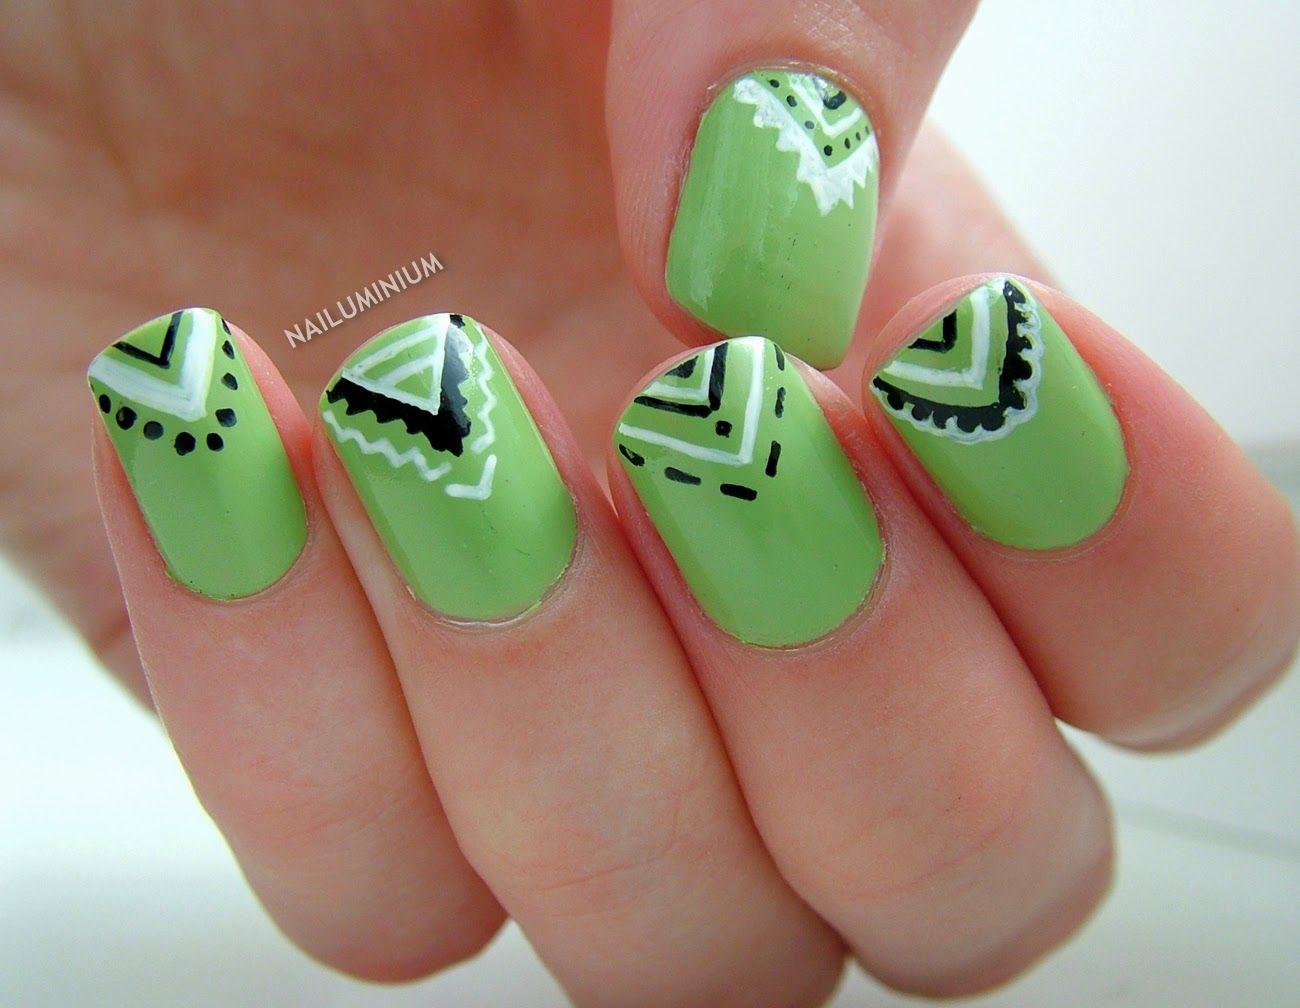 Pin de Belu Mingorance en diseños de uñas | Pinterest | Uñas verano ...